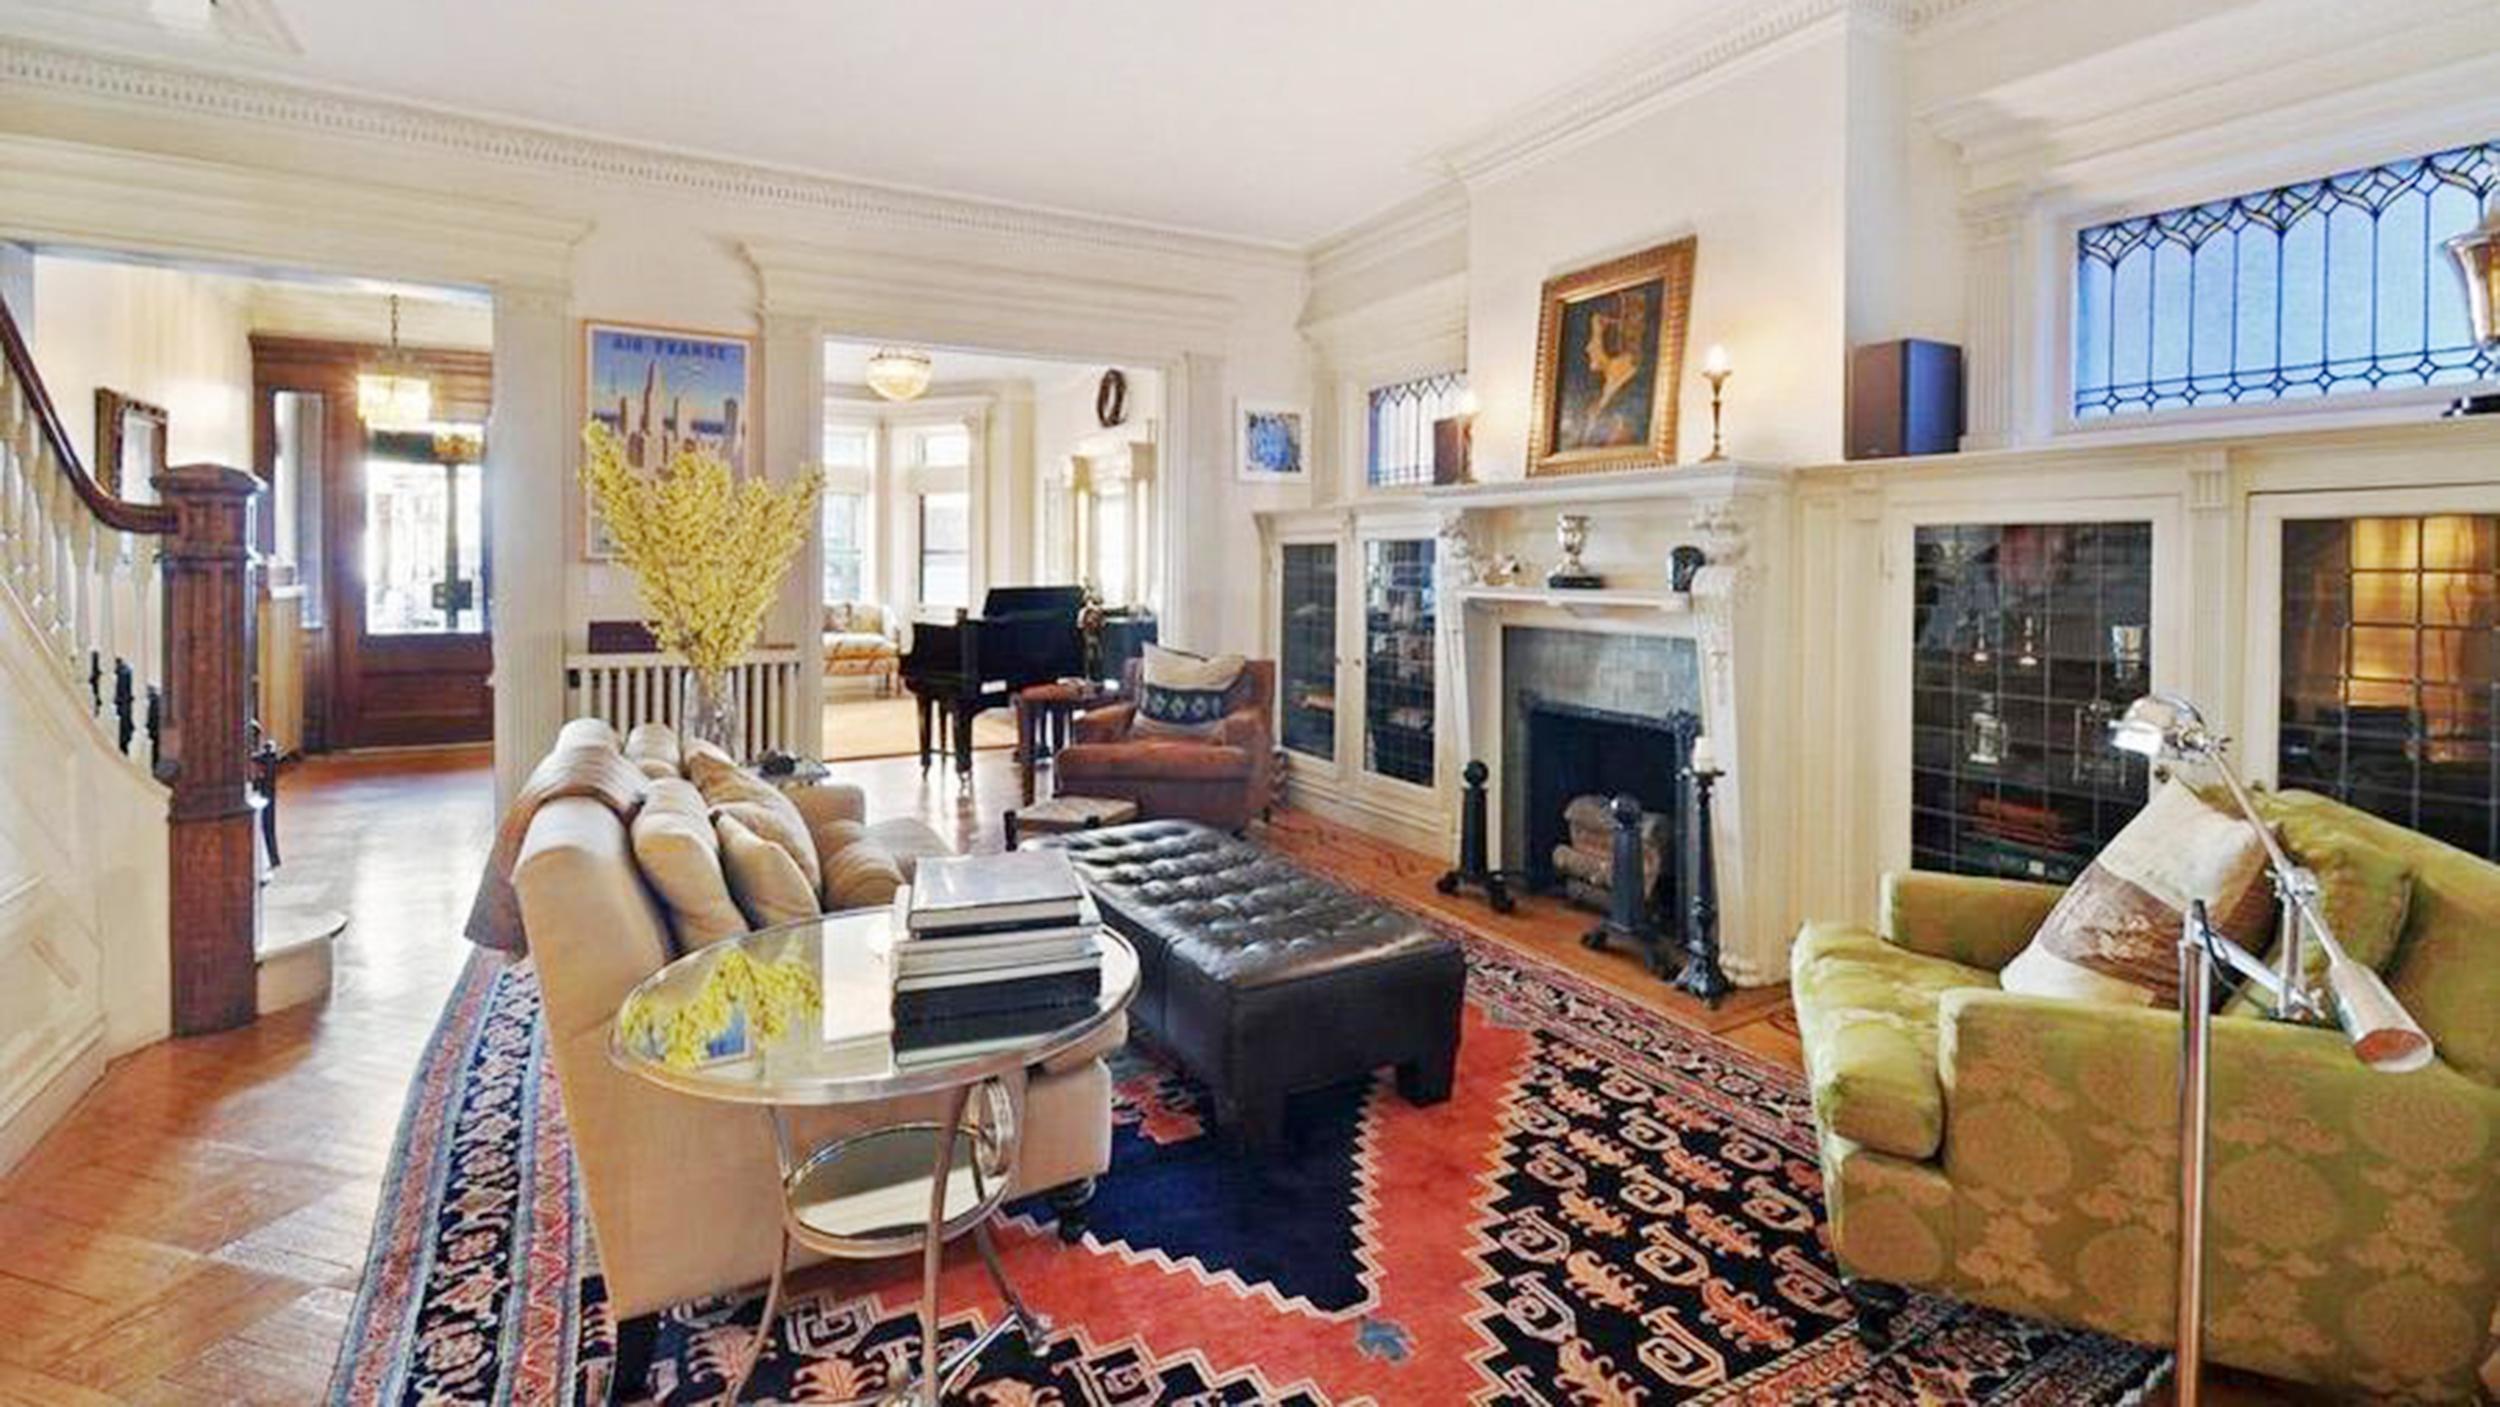 Emily Blunt And John Krasinski Buy Brooklyn Townhouse